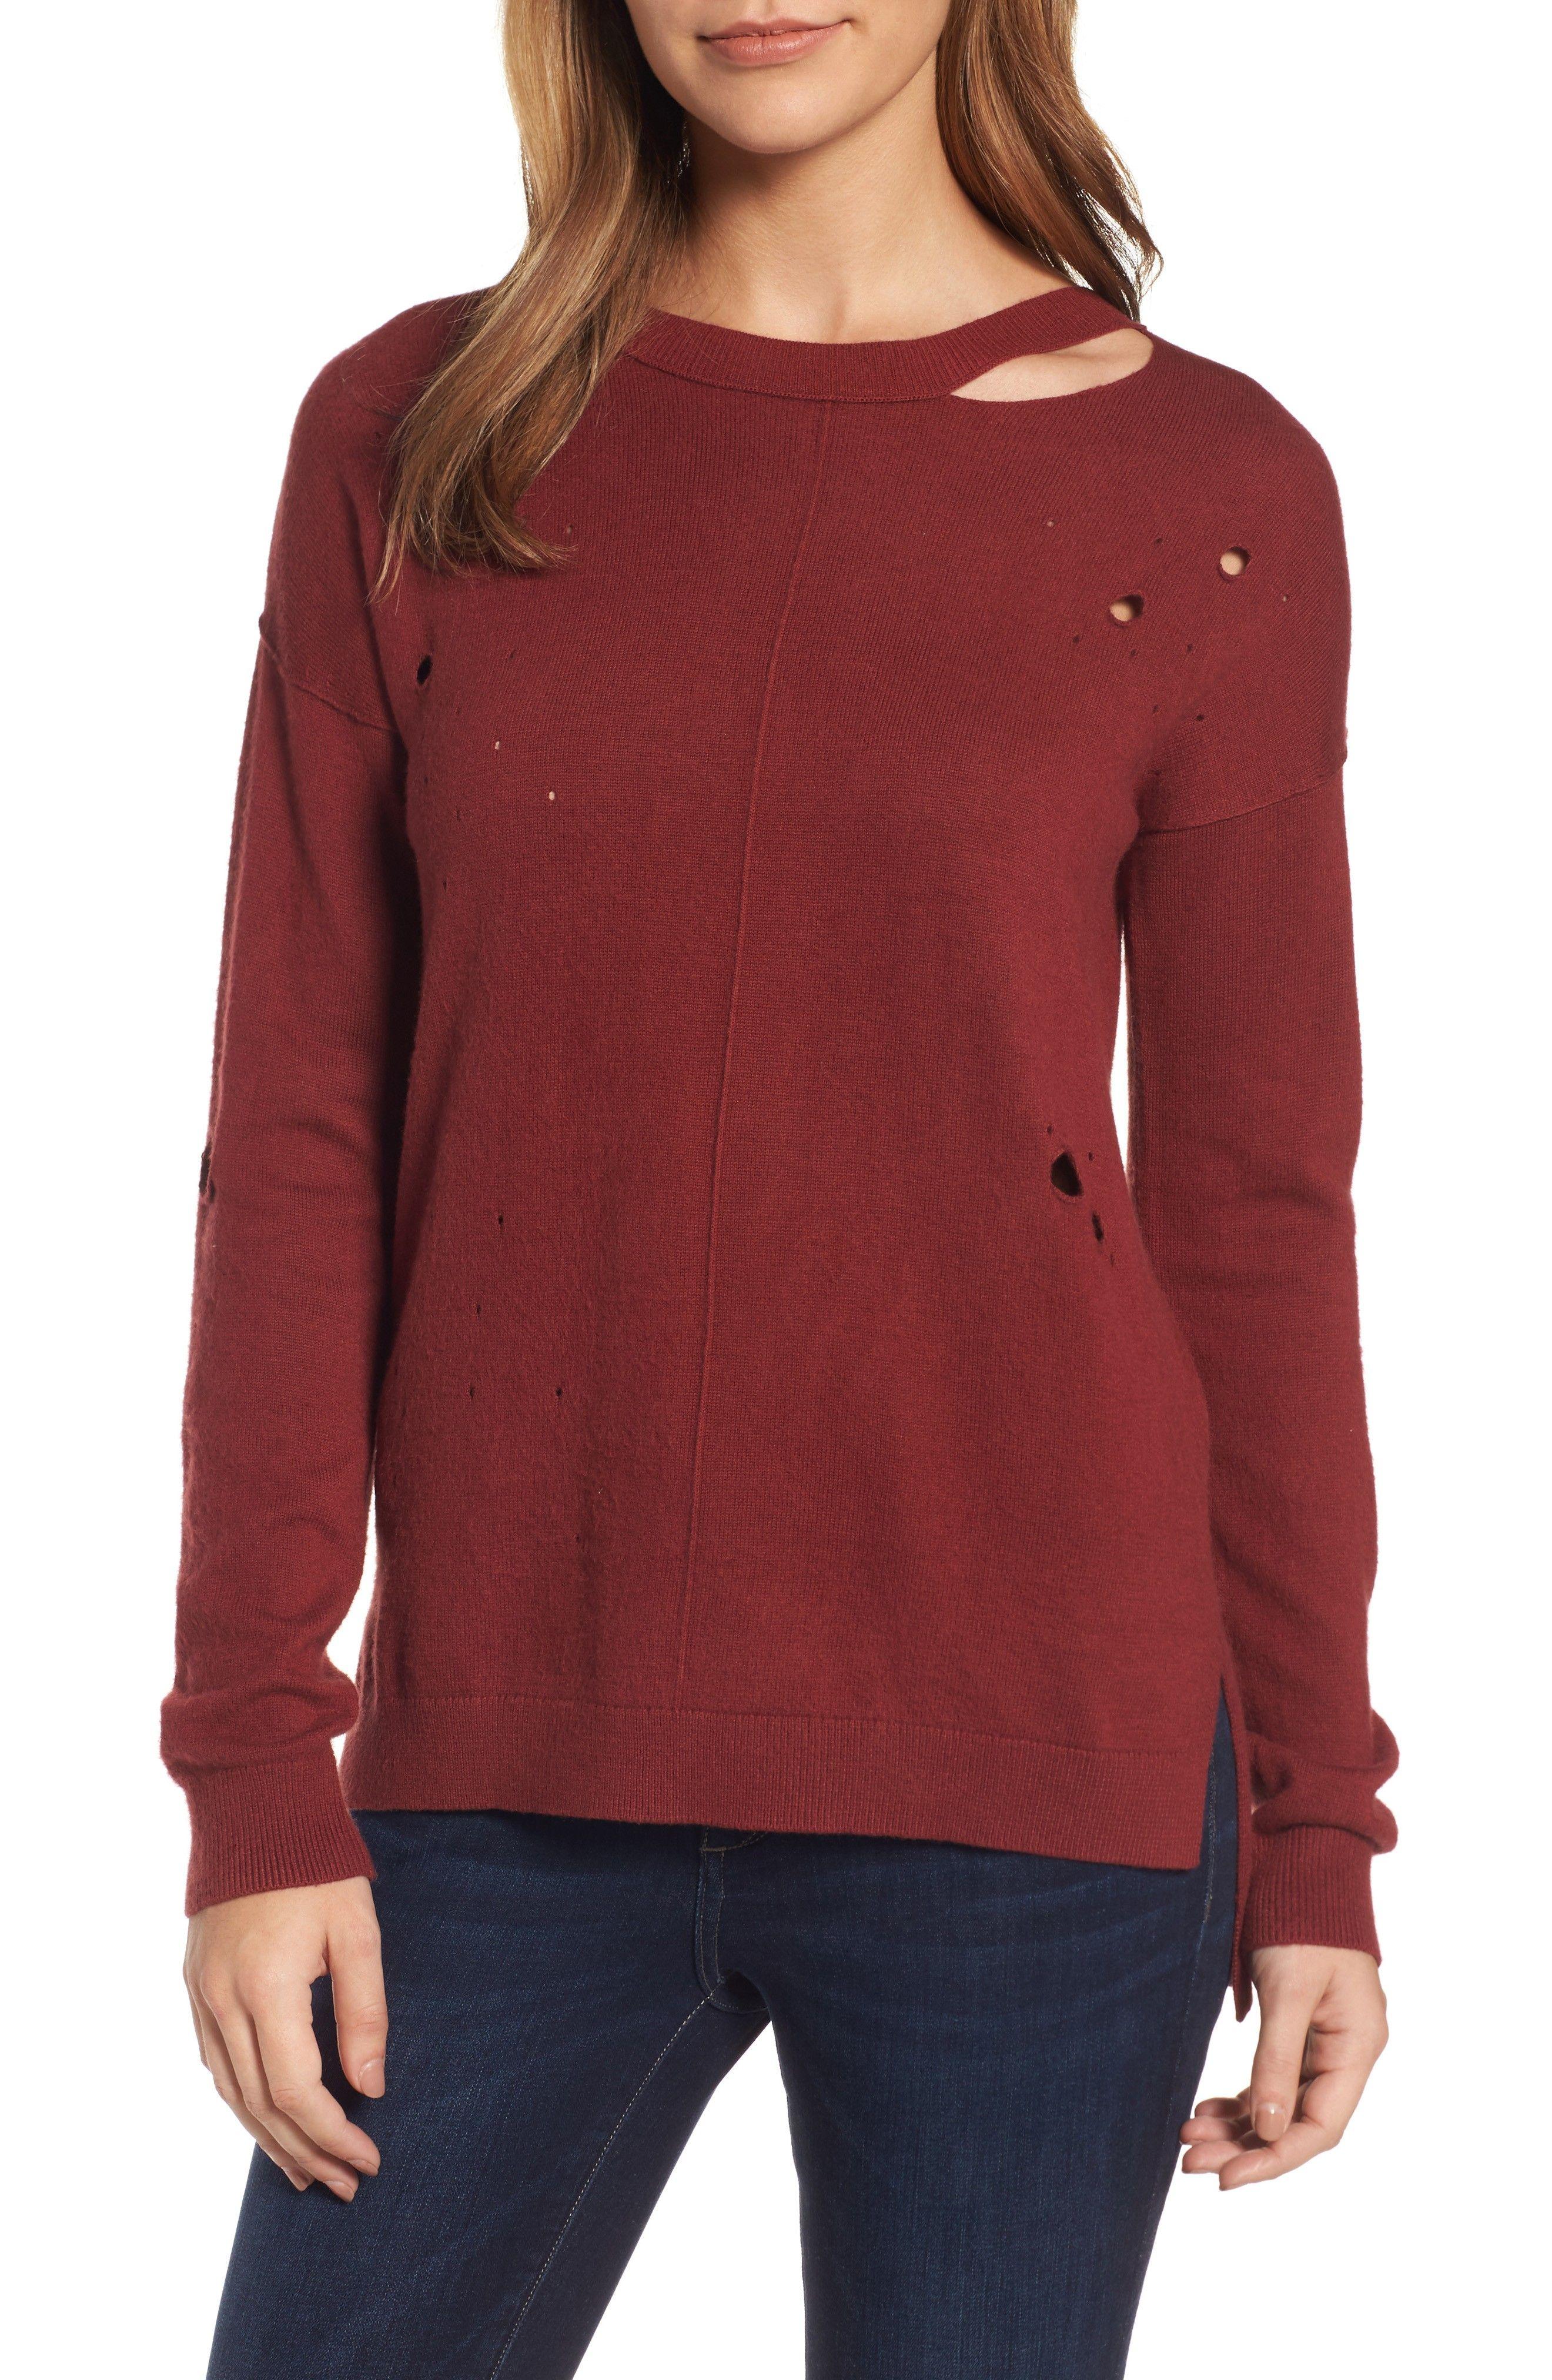 Distressed Sweater Distressed sweaters, Sweaters, Tunic tops